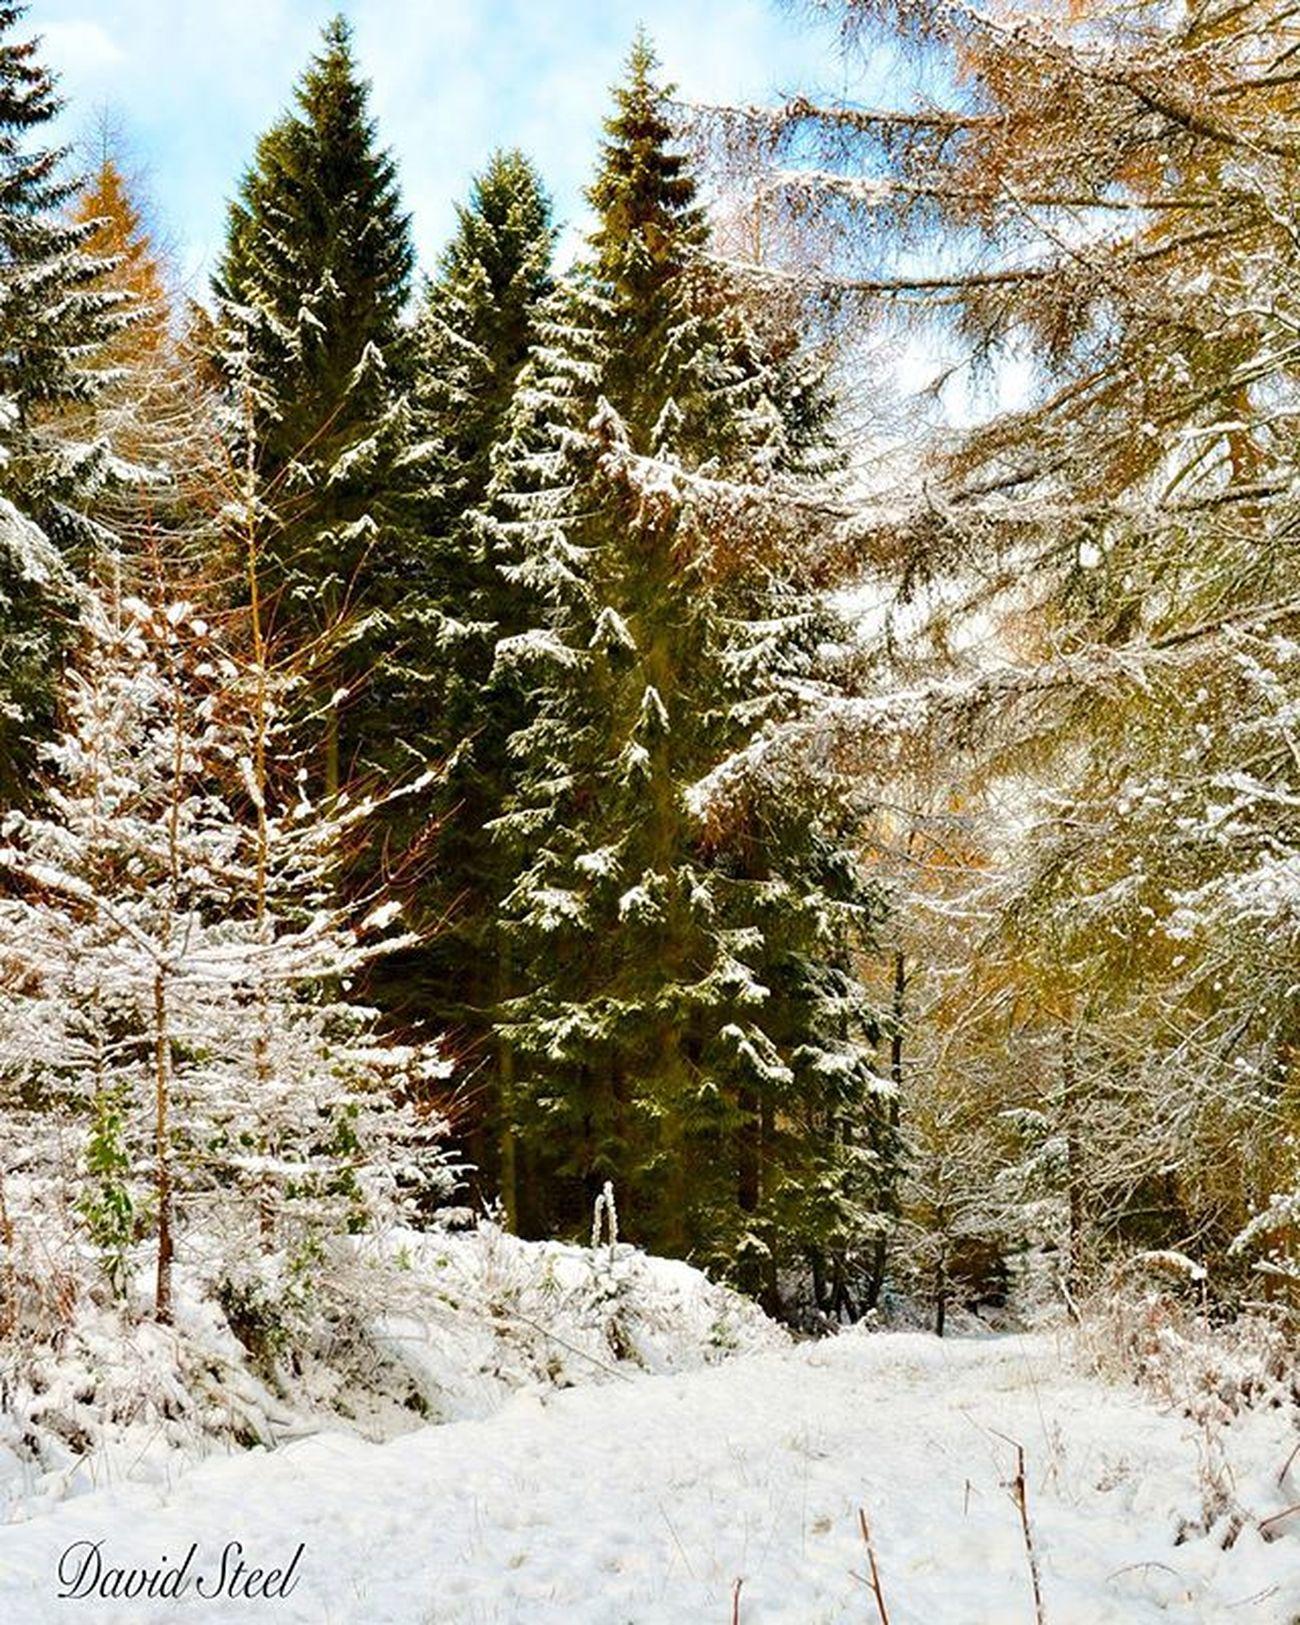 Calendar Park. First snowfall . ISO 100 f6.3 1/250. Princely_shotz Ig_captures Ig_shutterbugs Igbest_shots Insta_Scotland Loves_Scotland Ig_shots_magic Master_shots Special_shots Ig_Scotland Ig_supershots Igbest_shots Naturelover_gr Nature_sultans Nature_shooters Ig_landscapes Bnw_captures Bnwscotland Bnw_captures Nikon_photography Ig_Scotland Nikonphoto Nikond7000 snowday snow